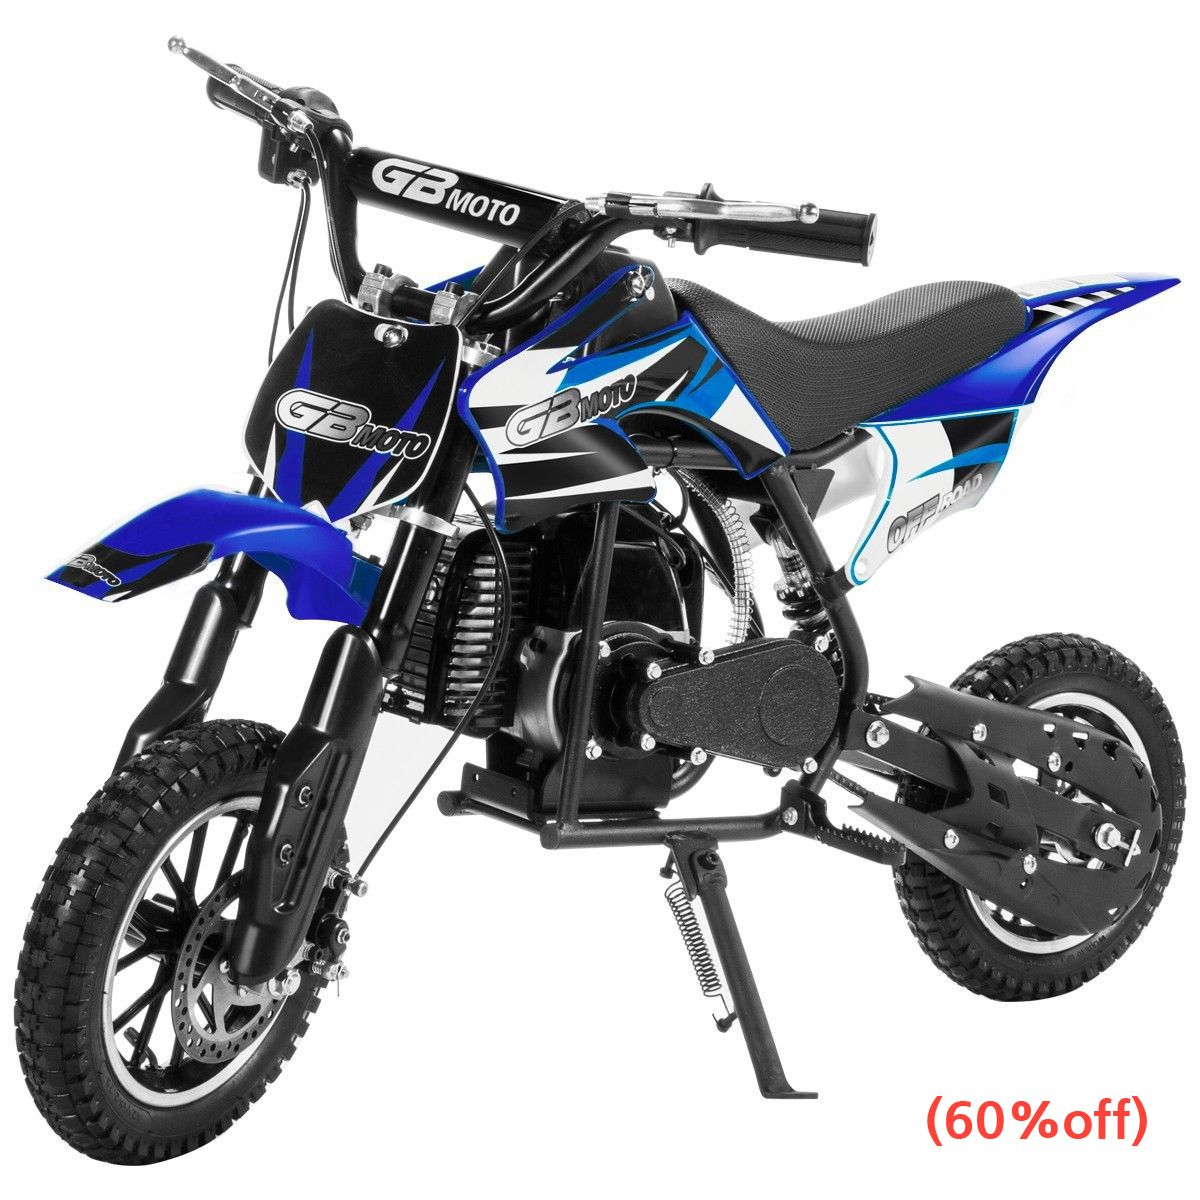 Details About Xtremepowerus 49cc 2 Stroke Gas Power Mini Pocket